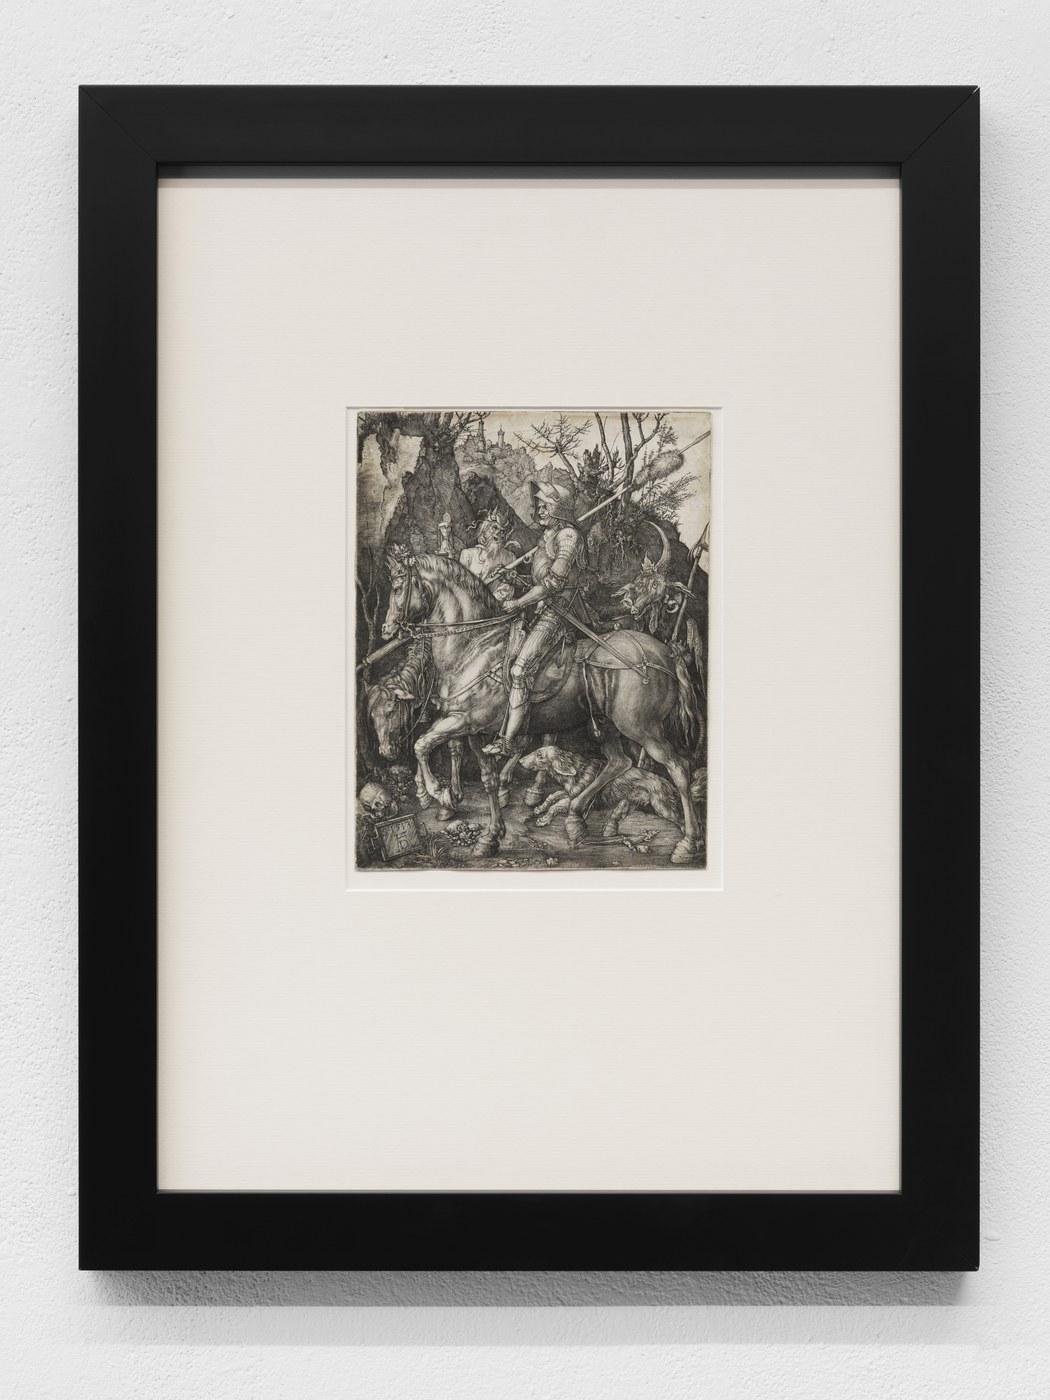 10. Albrecht Durer - Knight Death, and the Devil, 1513